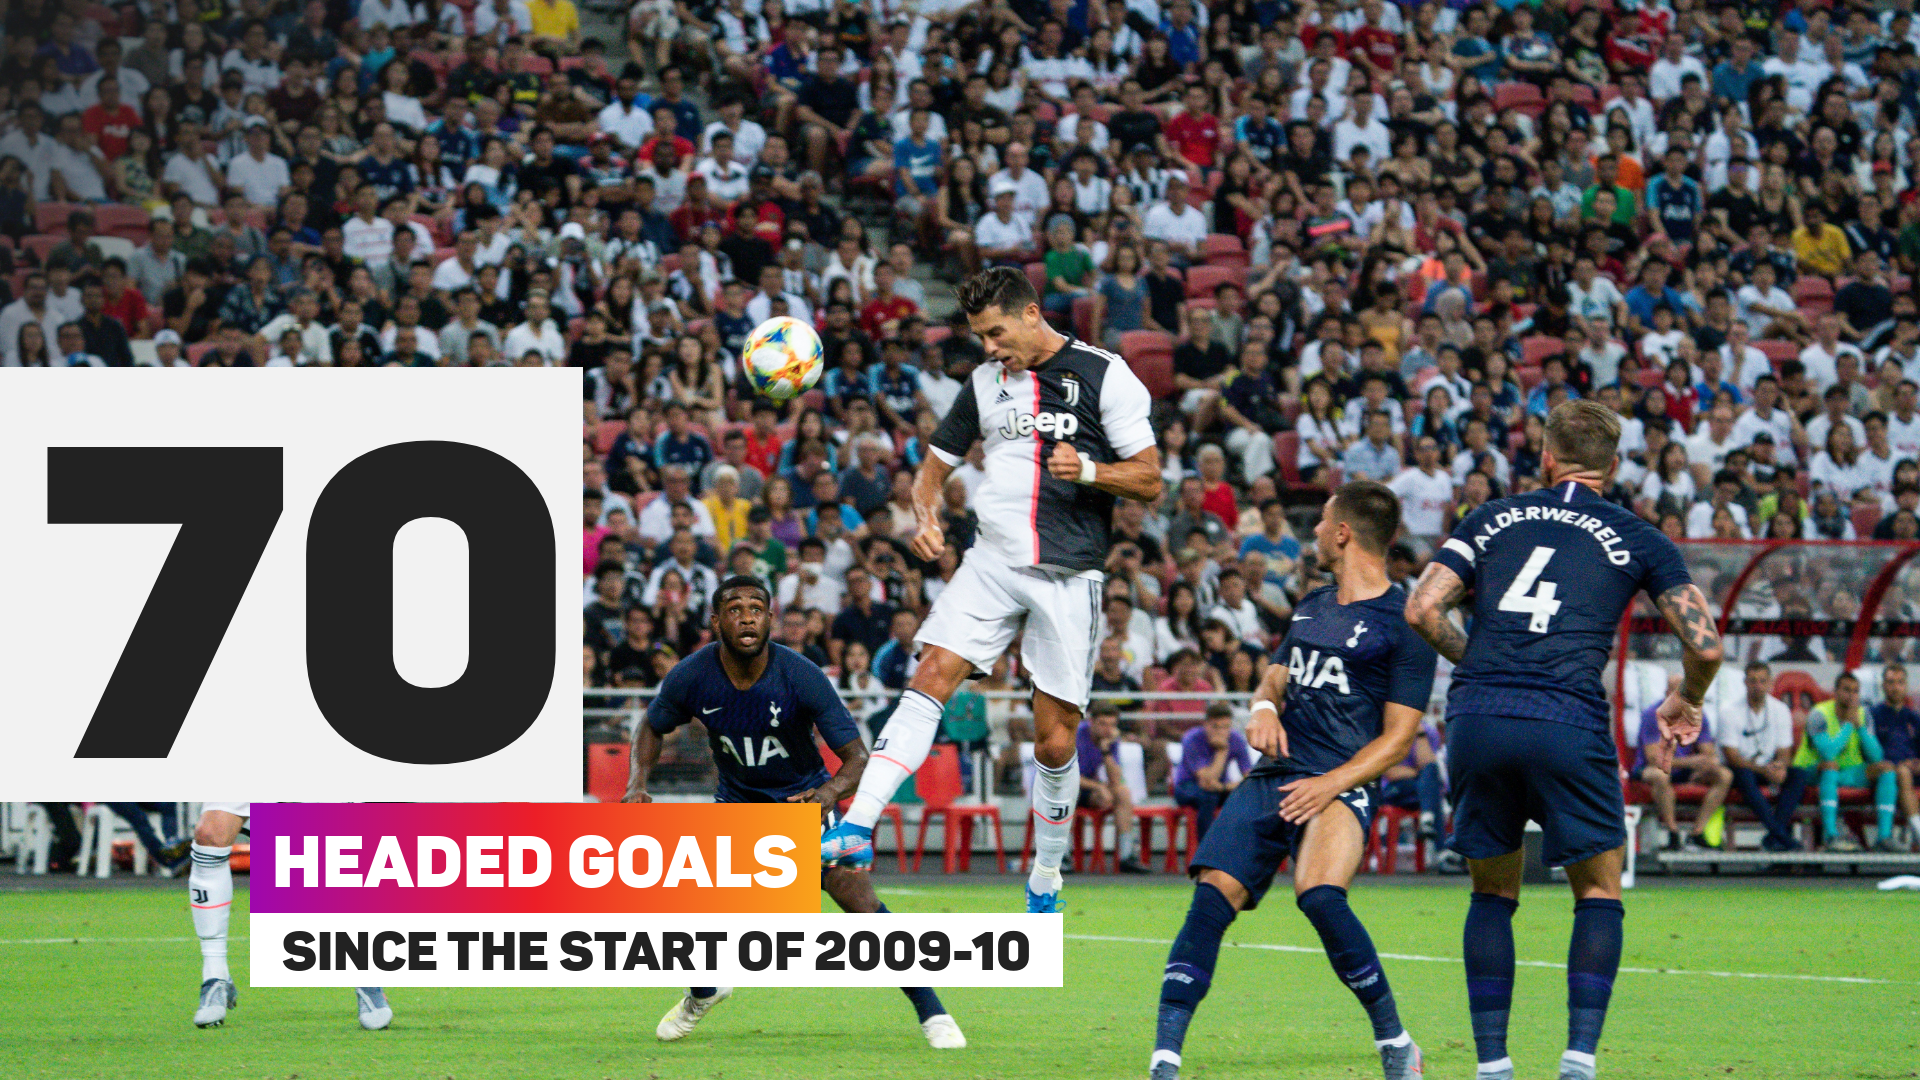 Cristiano Ronaldo has scored 70 headed club goals since leaving Manchester United